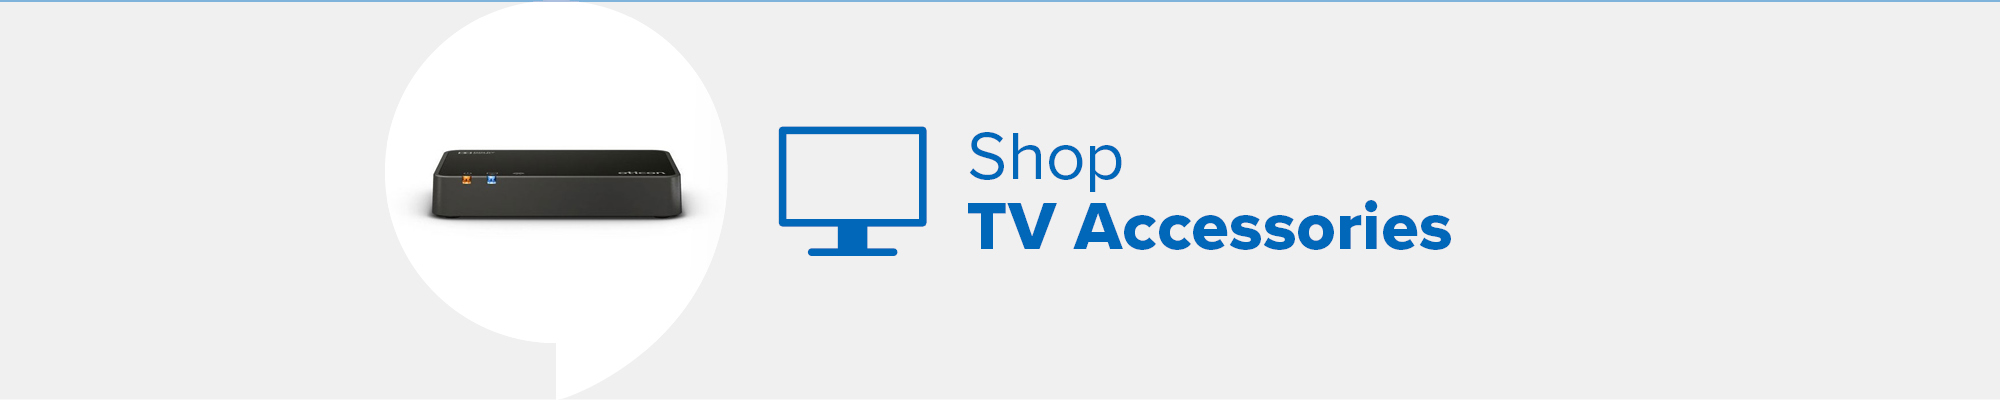 hl-shop-category-tv-accessories